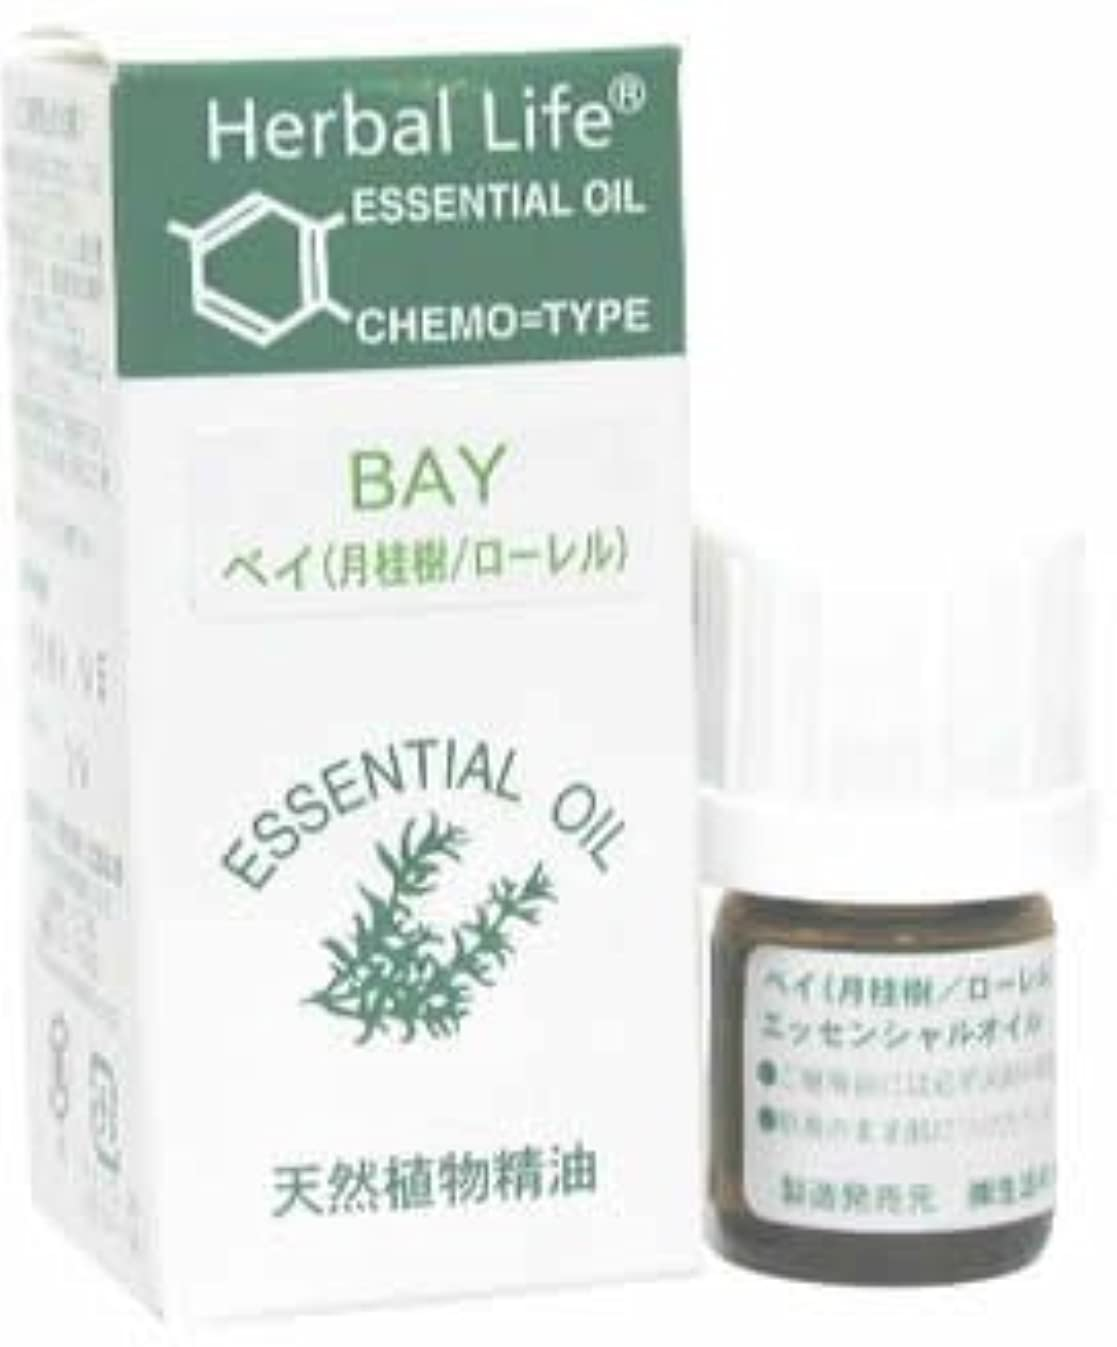 Herbal Life ベイ(ローレル 月桂樹) 3ml